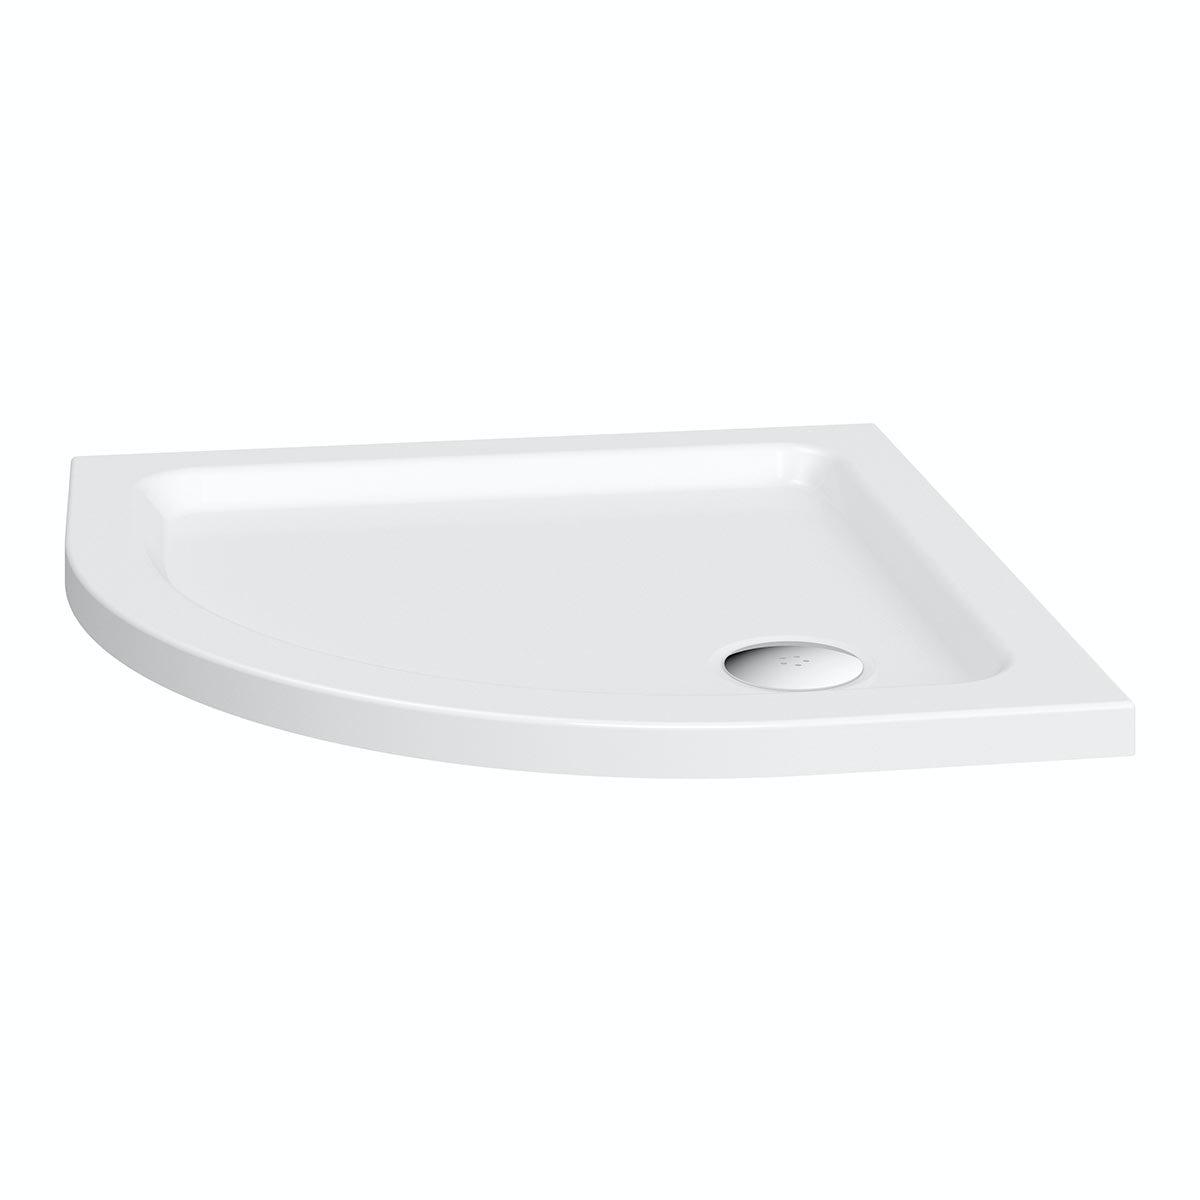 Simplite Quadrant Shower Tray 800 X 800